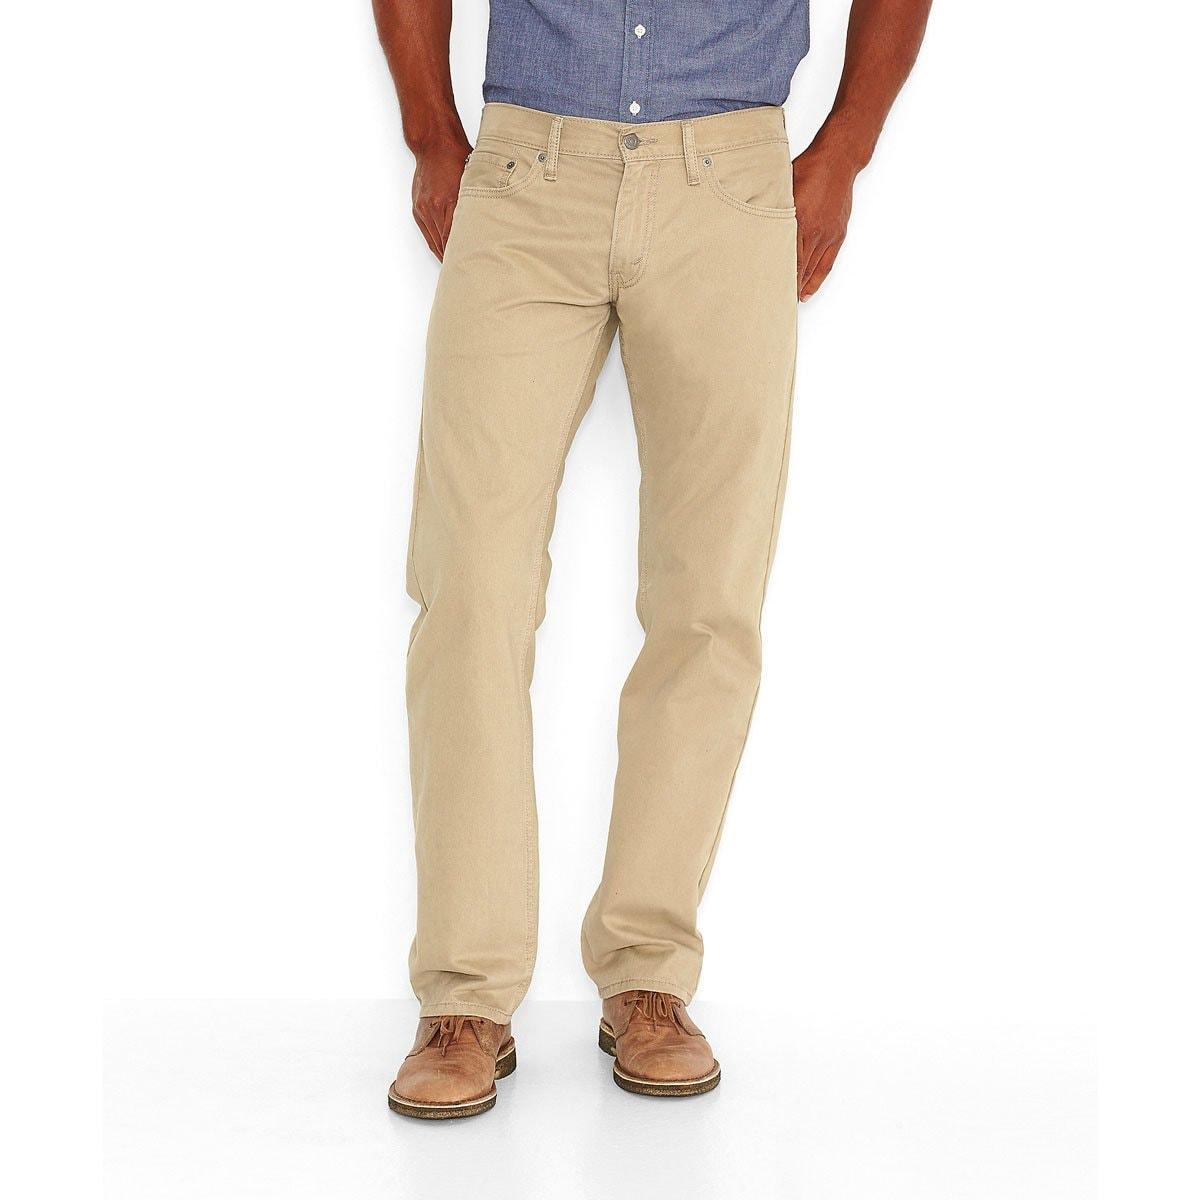 Pantalon Levis 514 Slim Straight